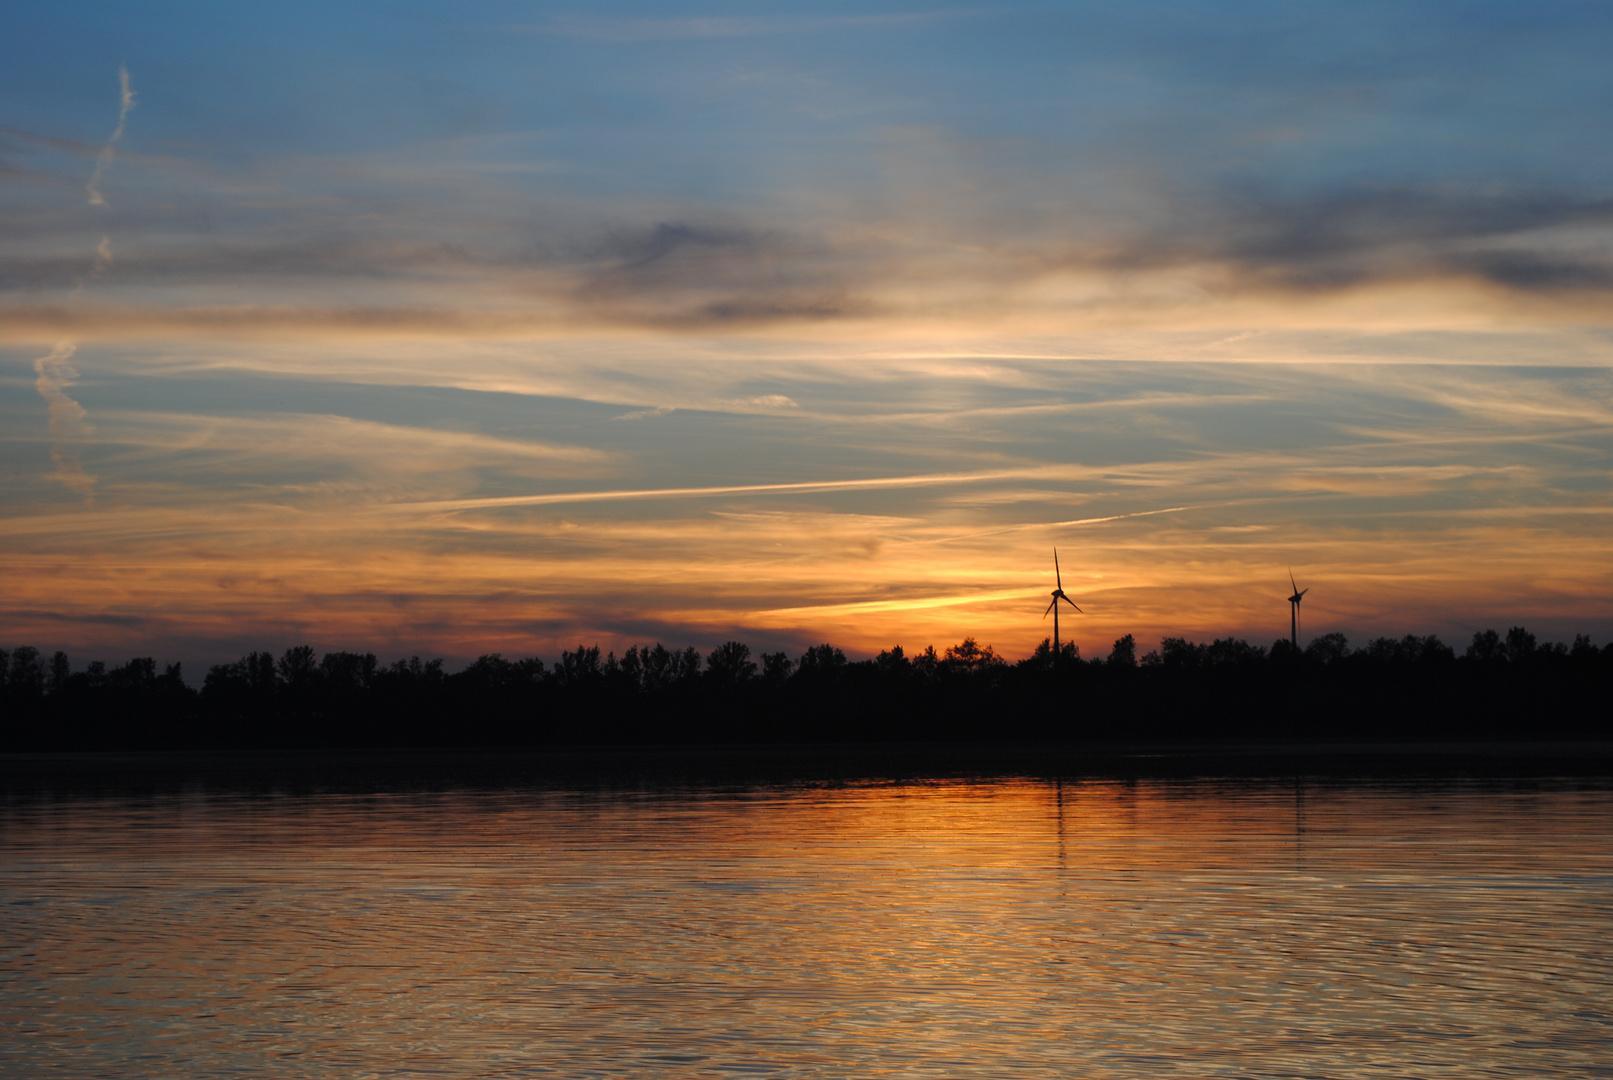 Sonnenuntergang am Kulkwitzer See in Leipzig.